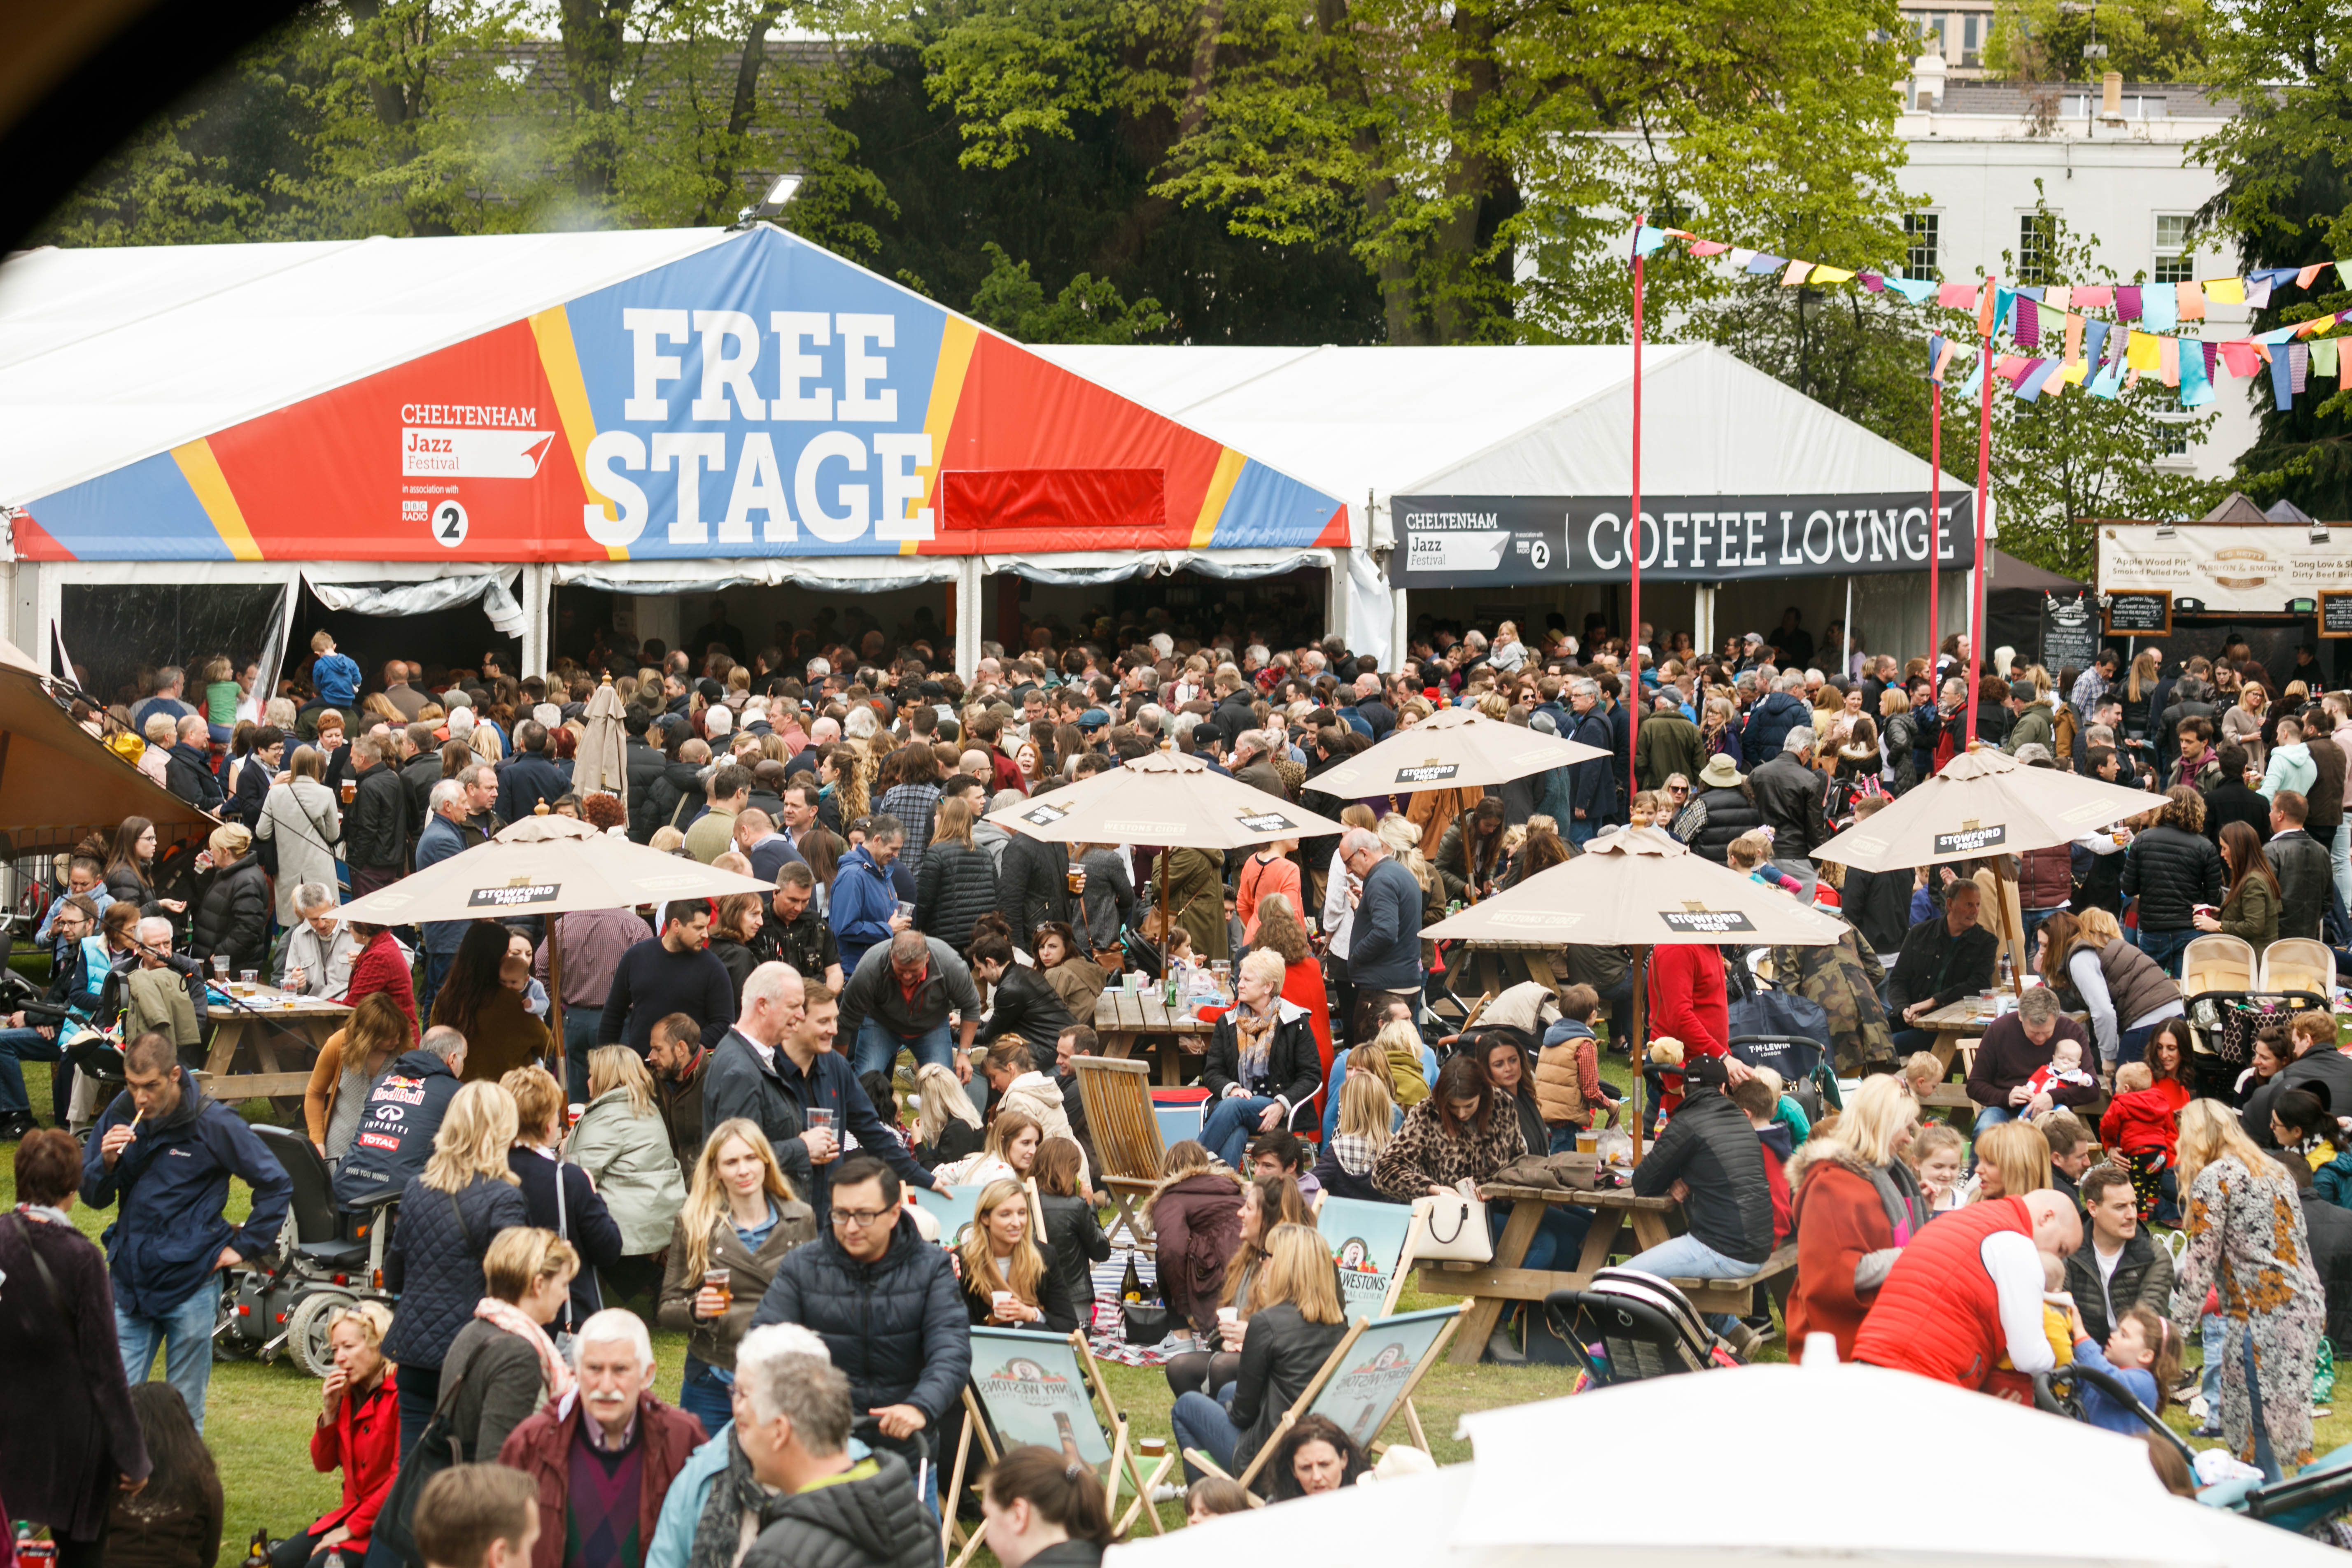 Cheltenham Jazz Festival Free Events - Around The Town